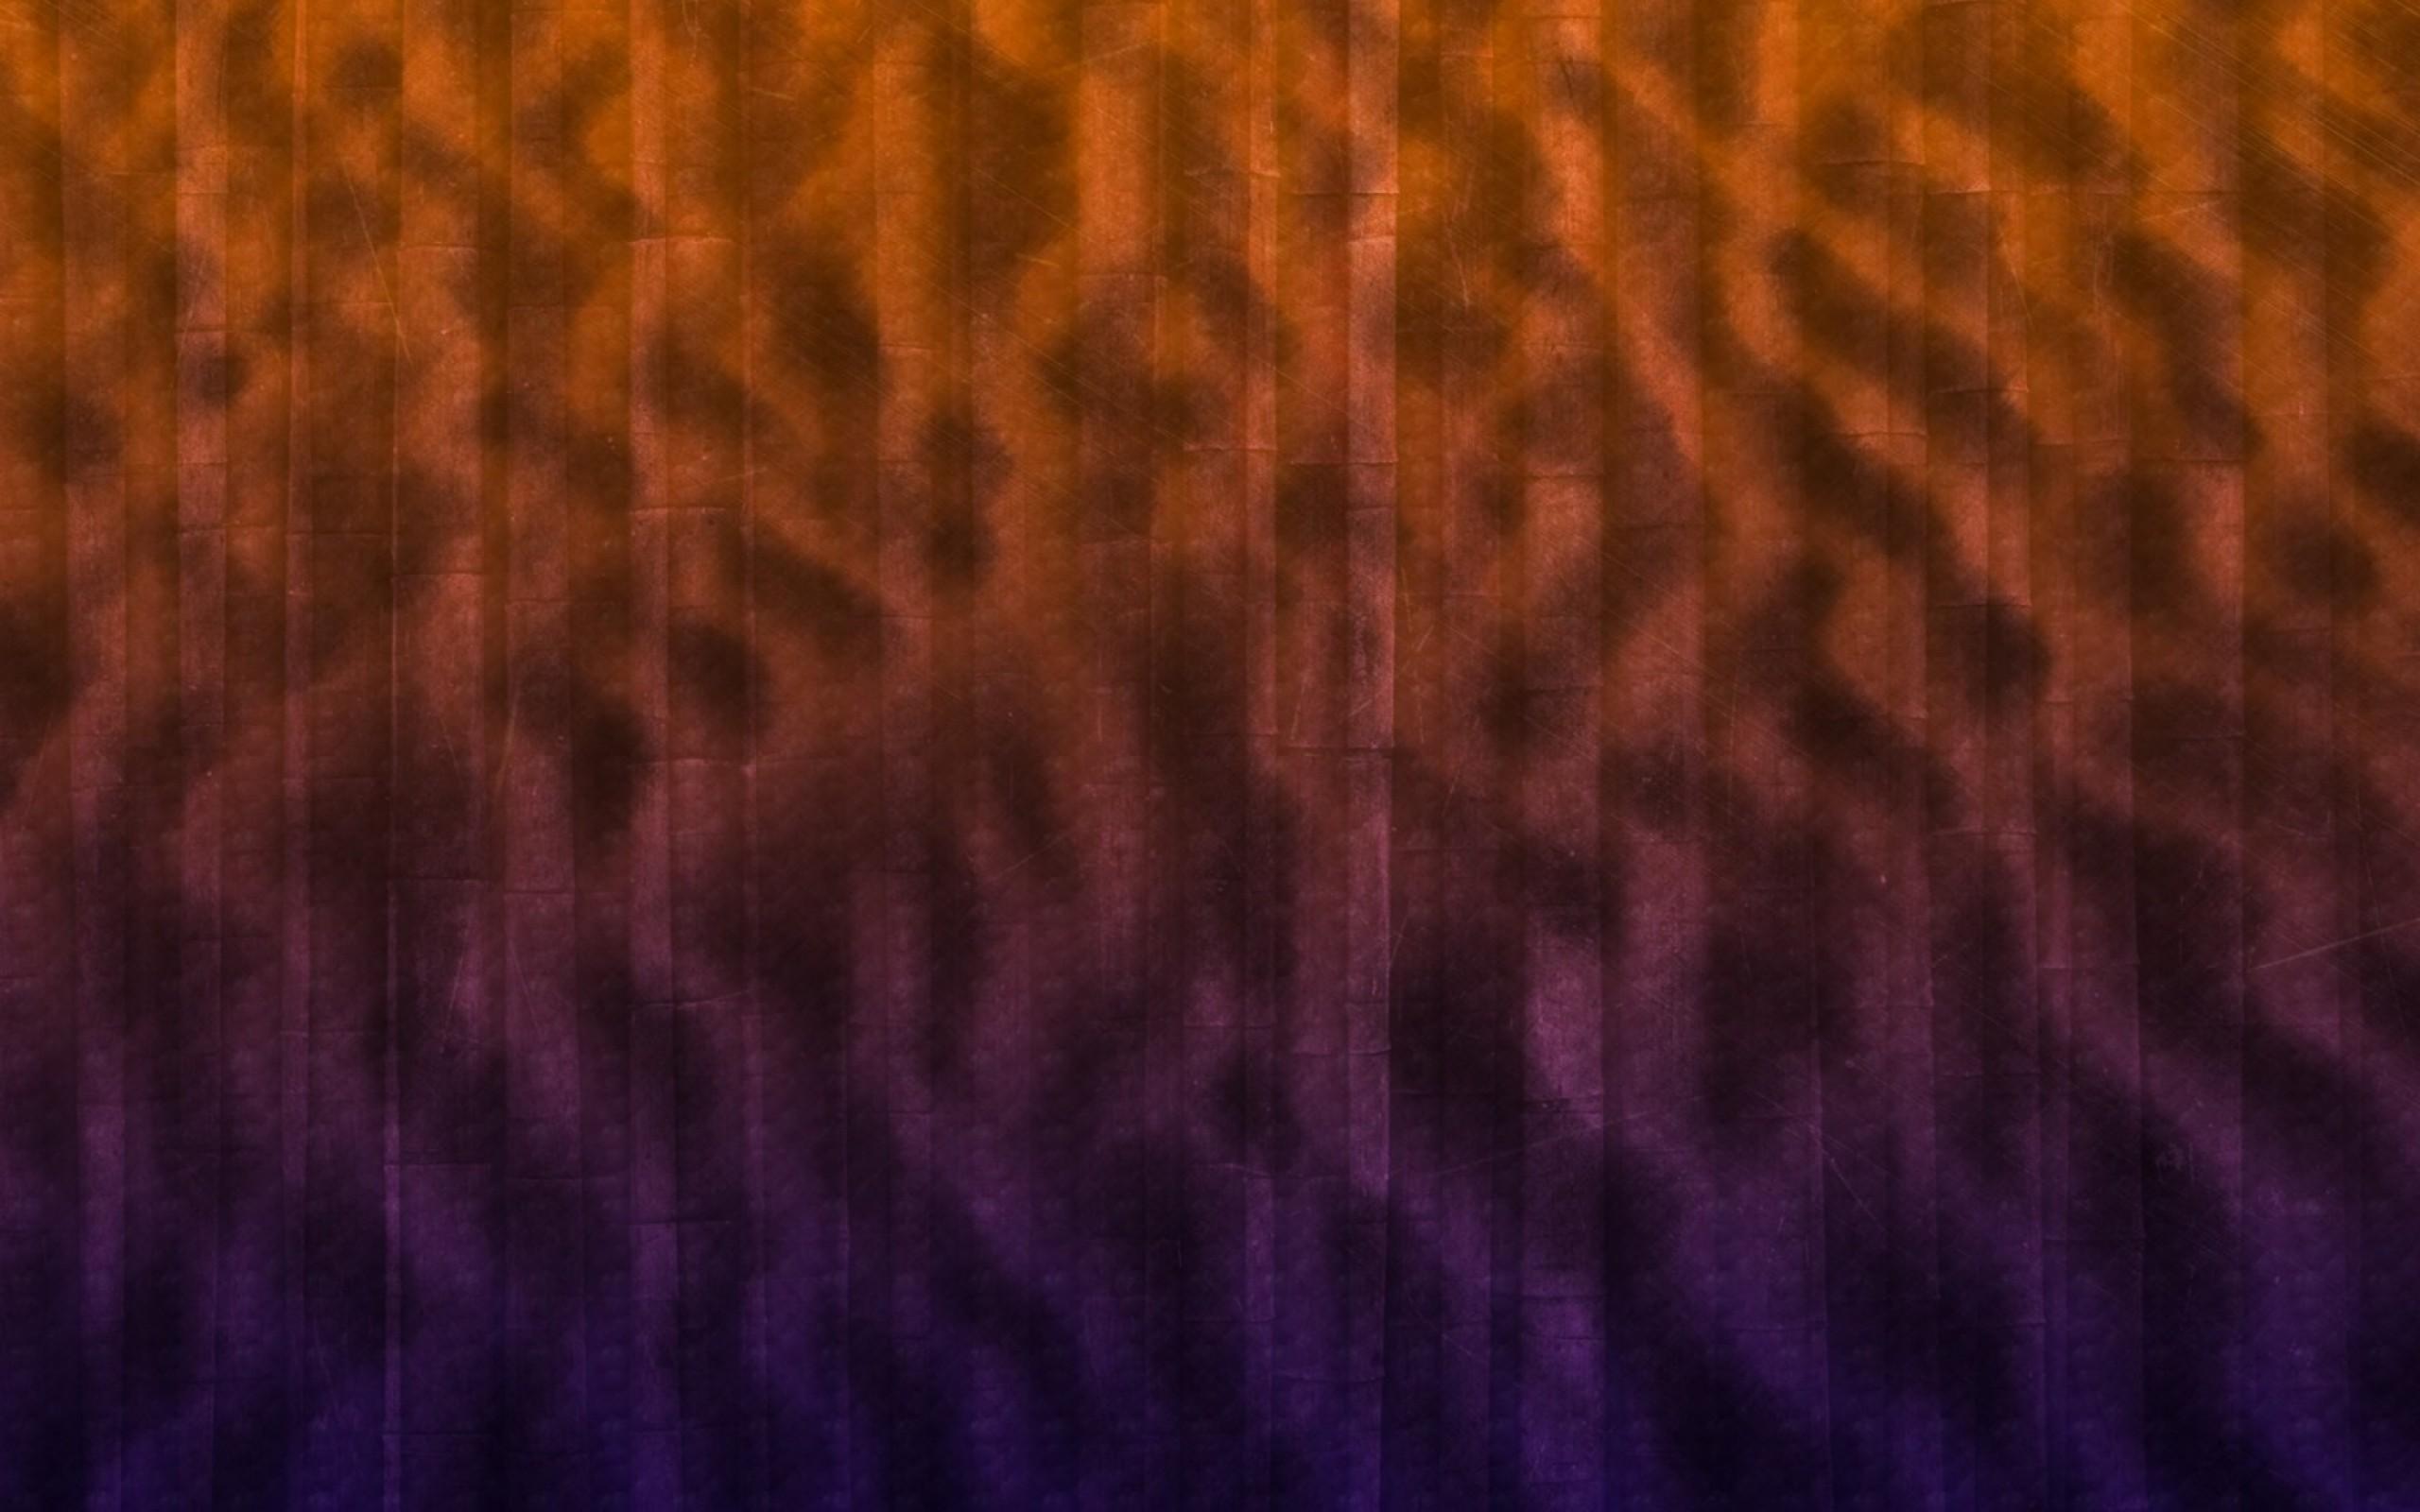 Wallpaper exture, purple, orange, yellow, wavy, strip